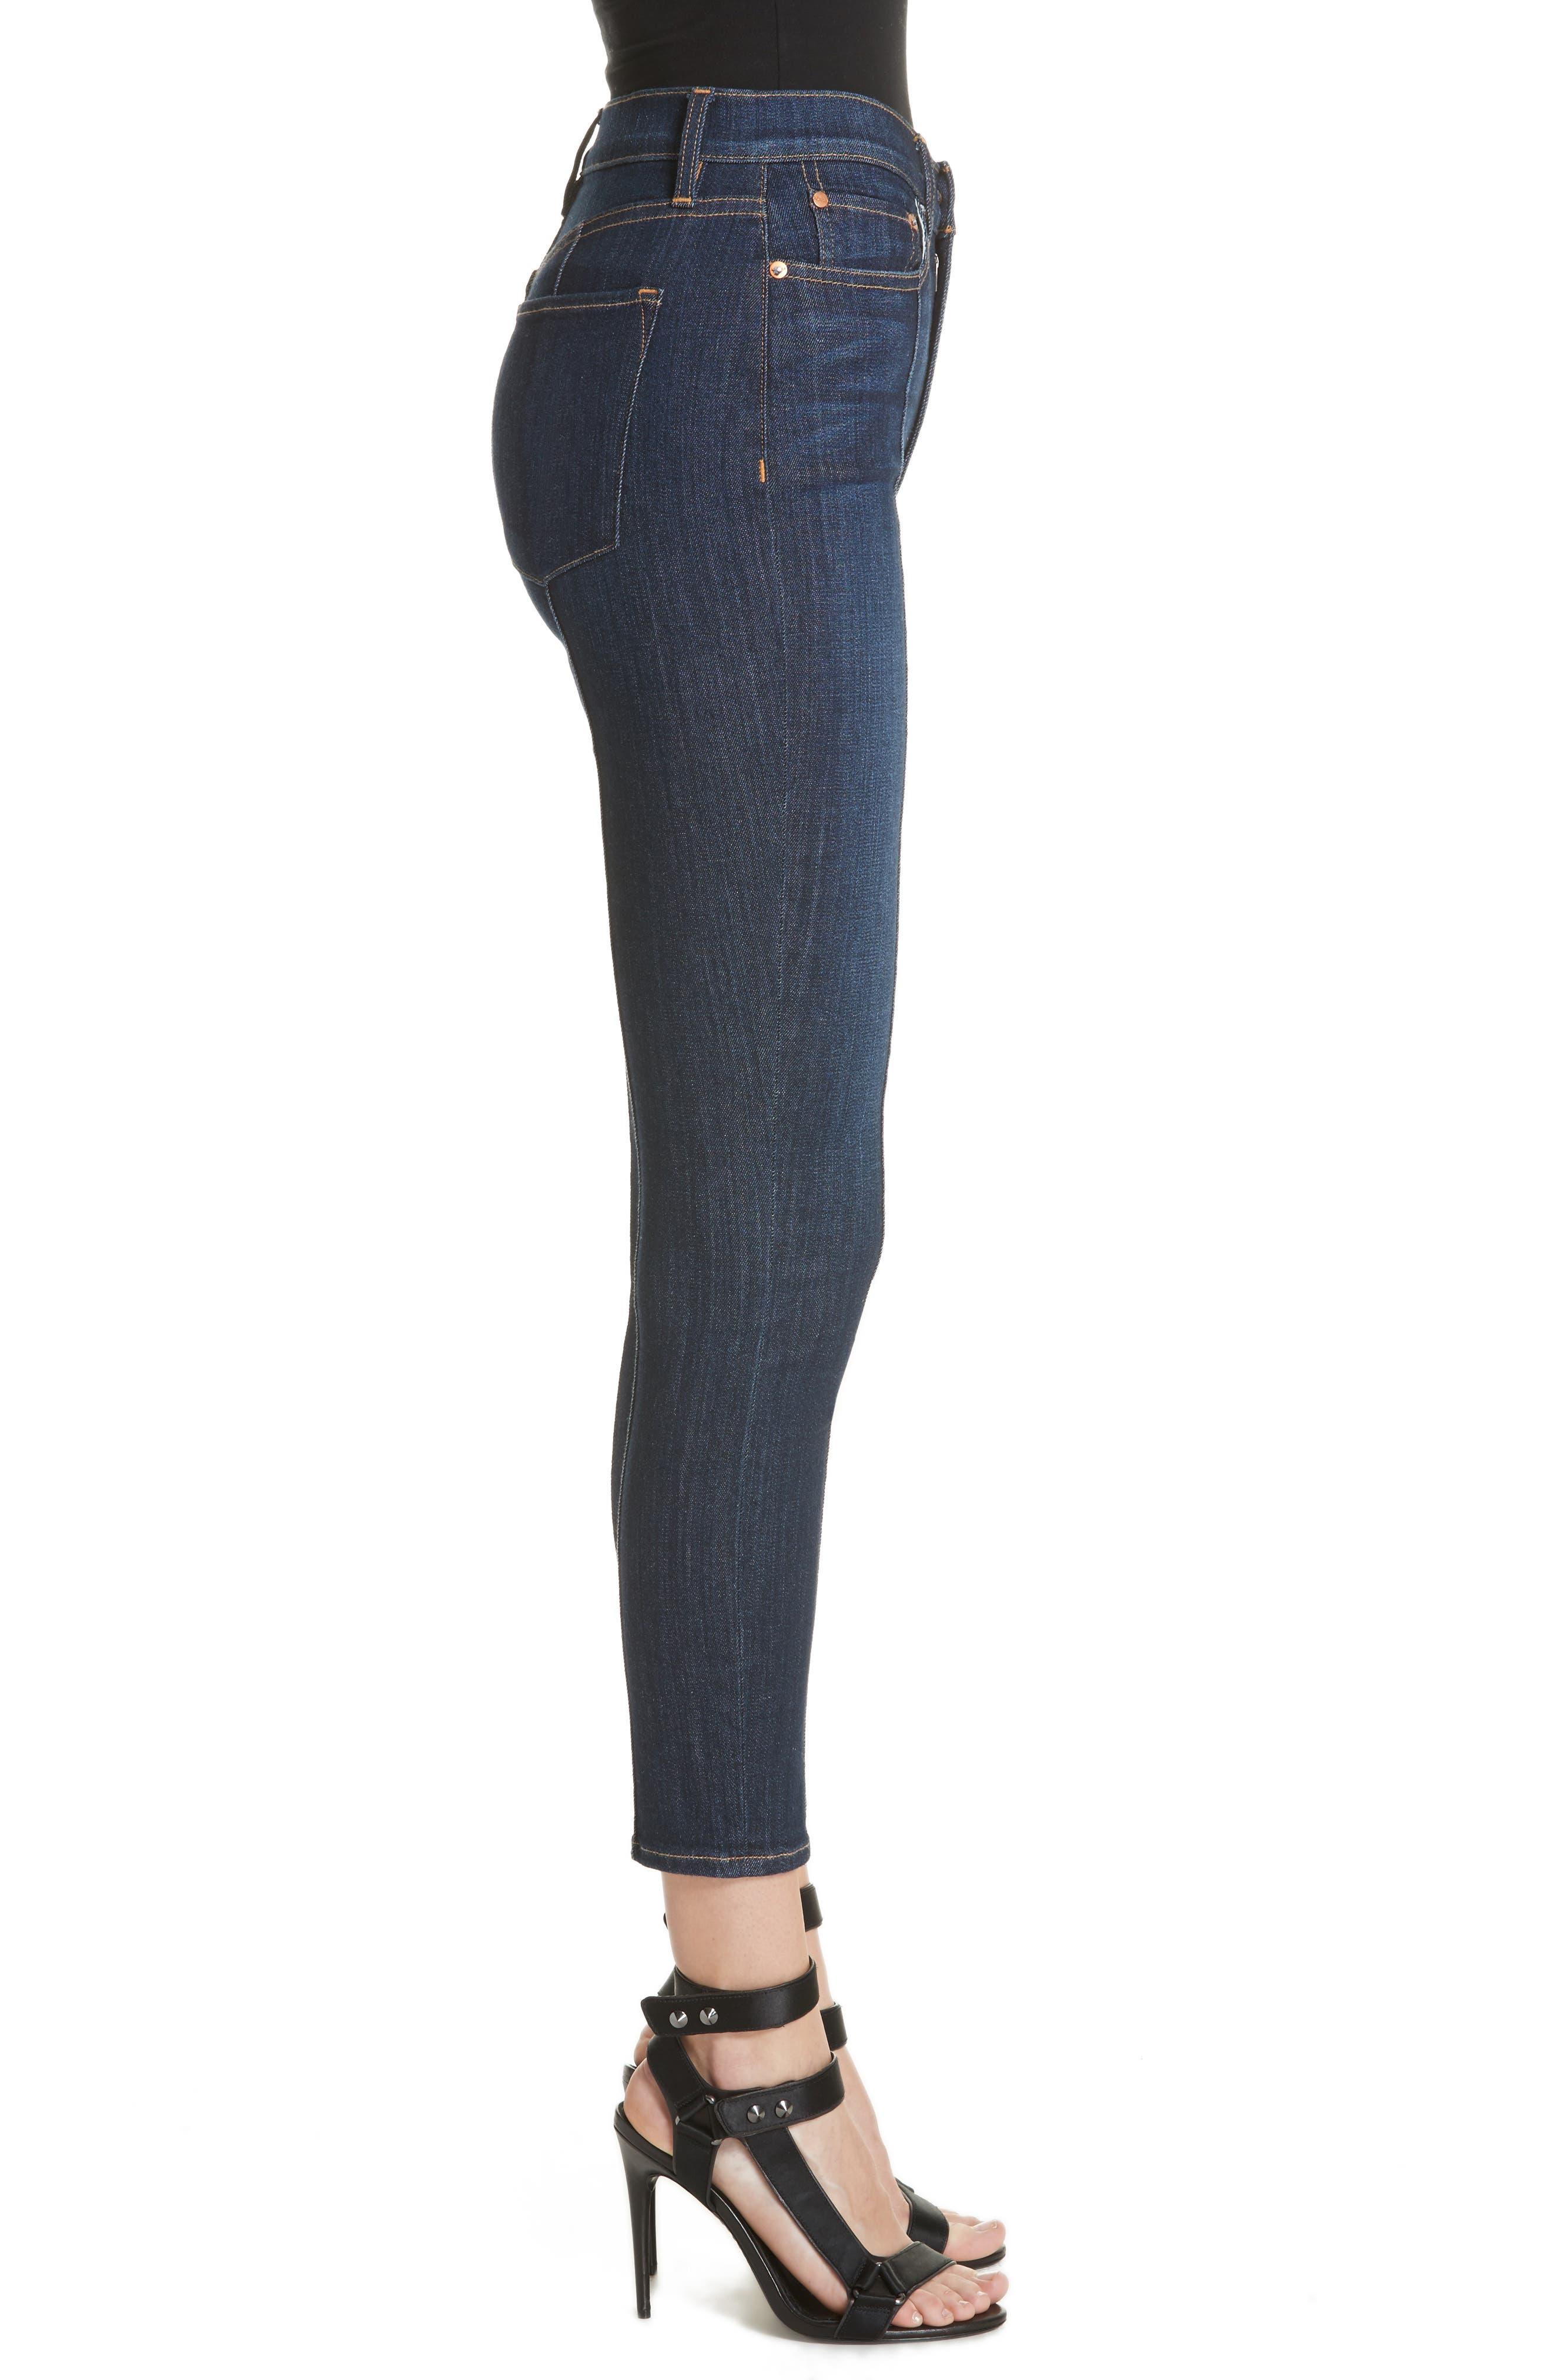 AO.LA Good High Waist Pintuck Skinny Jeans,                             Alternate thumbnail 3, color,                             Dream On